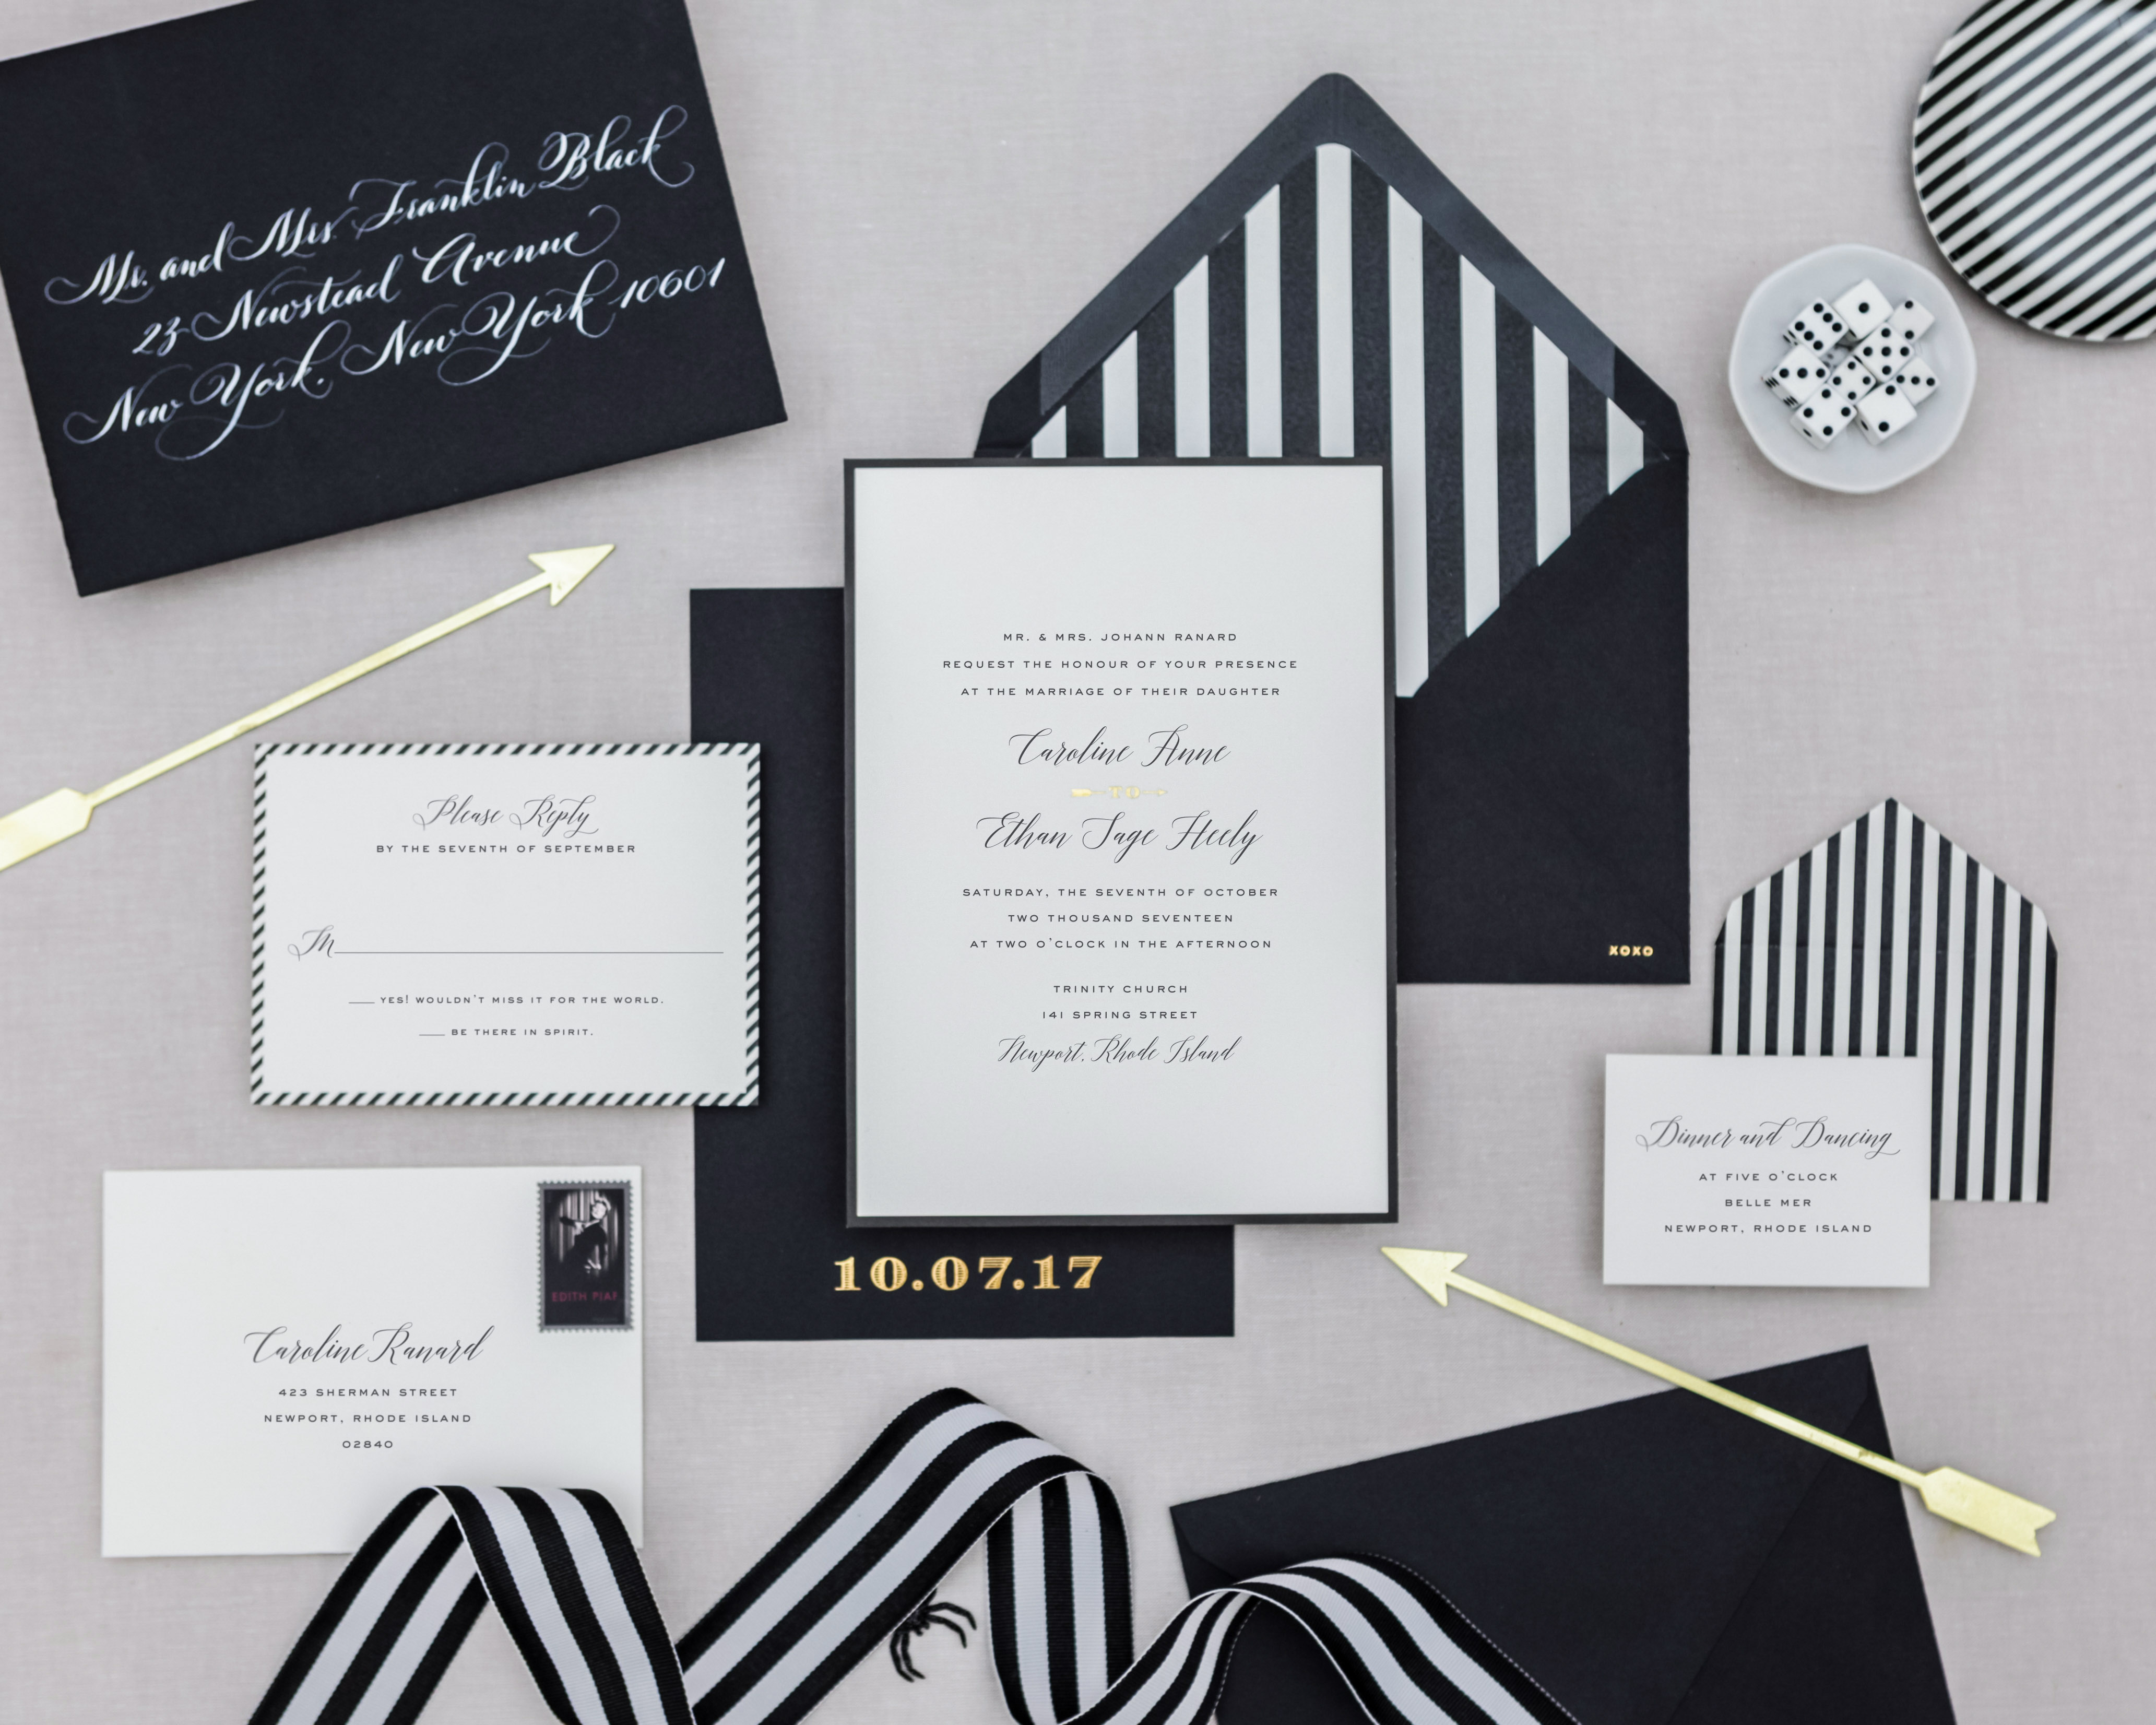 black and white striped modern invitations set